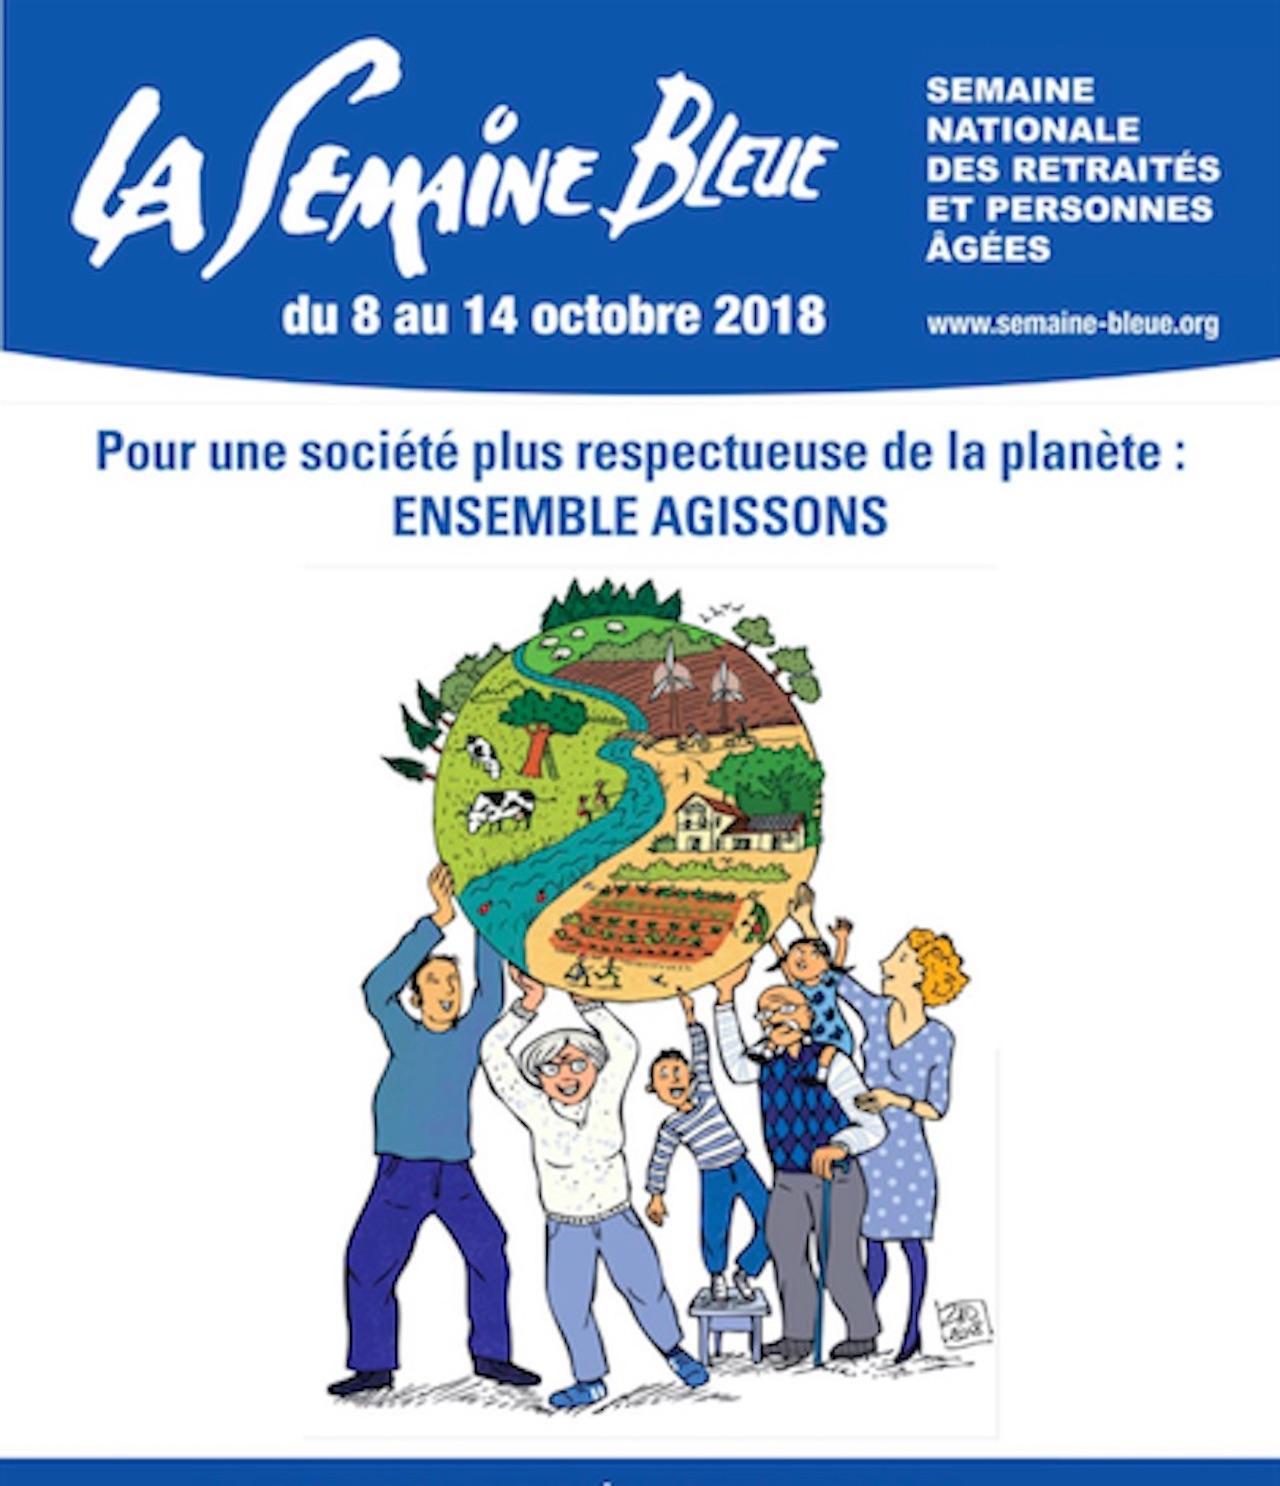 Programme de la semaine bleue - Martinique/Guadeloupe